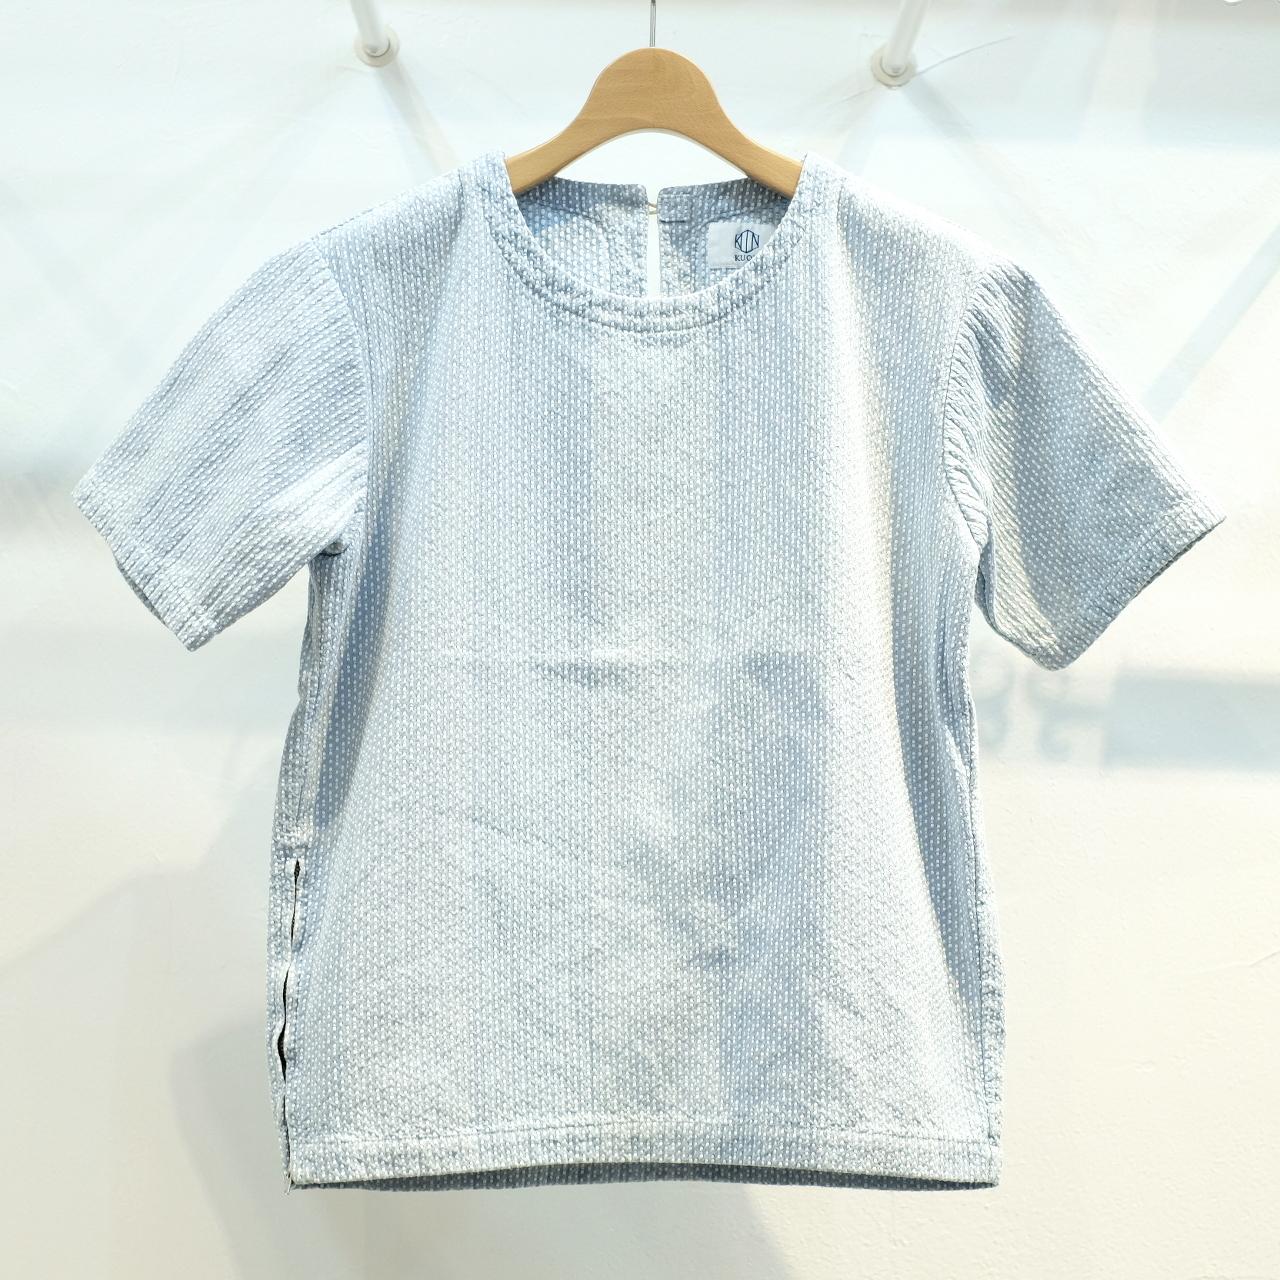 KUON(クオン) 遠州カツオ縞刺し子ブリーチ 半袖プルオーバーシャツ(カットソー)